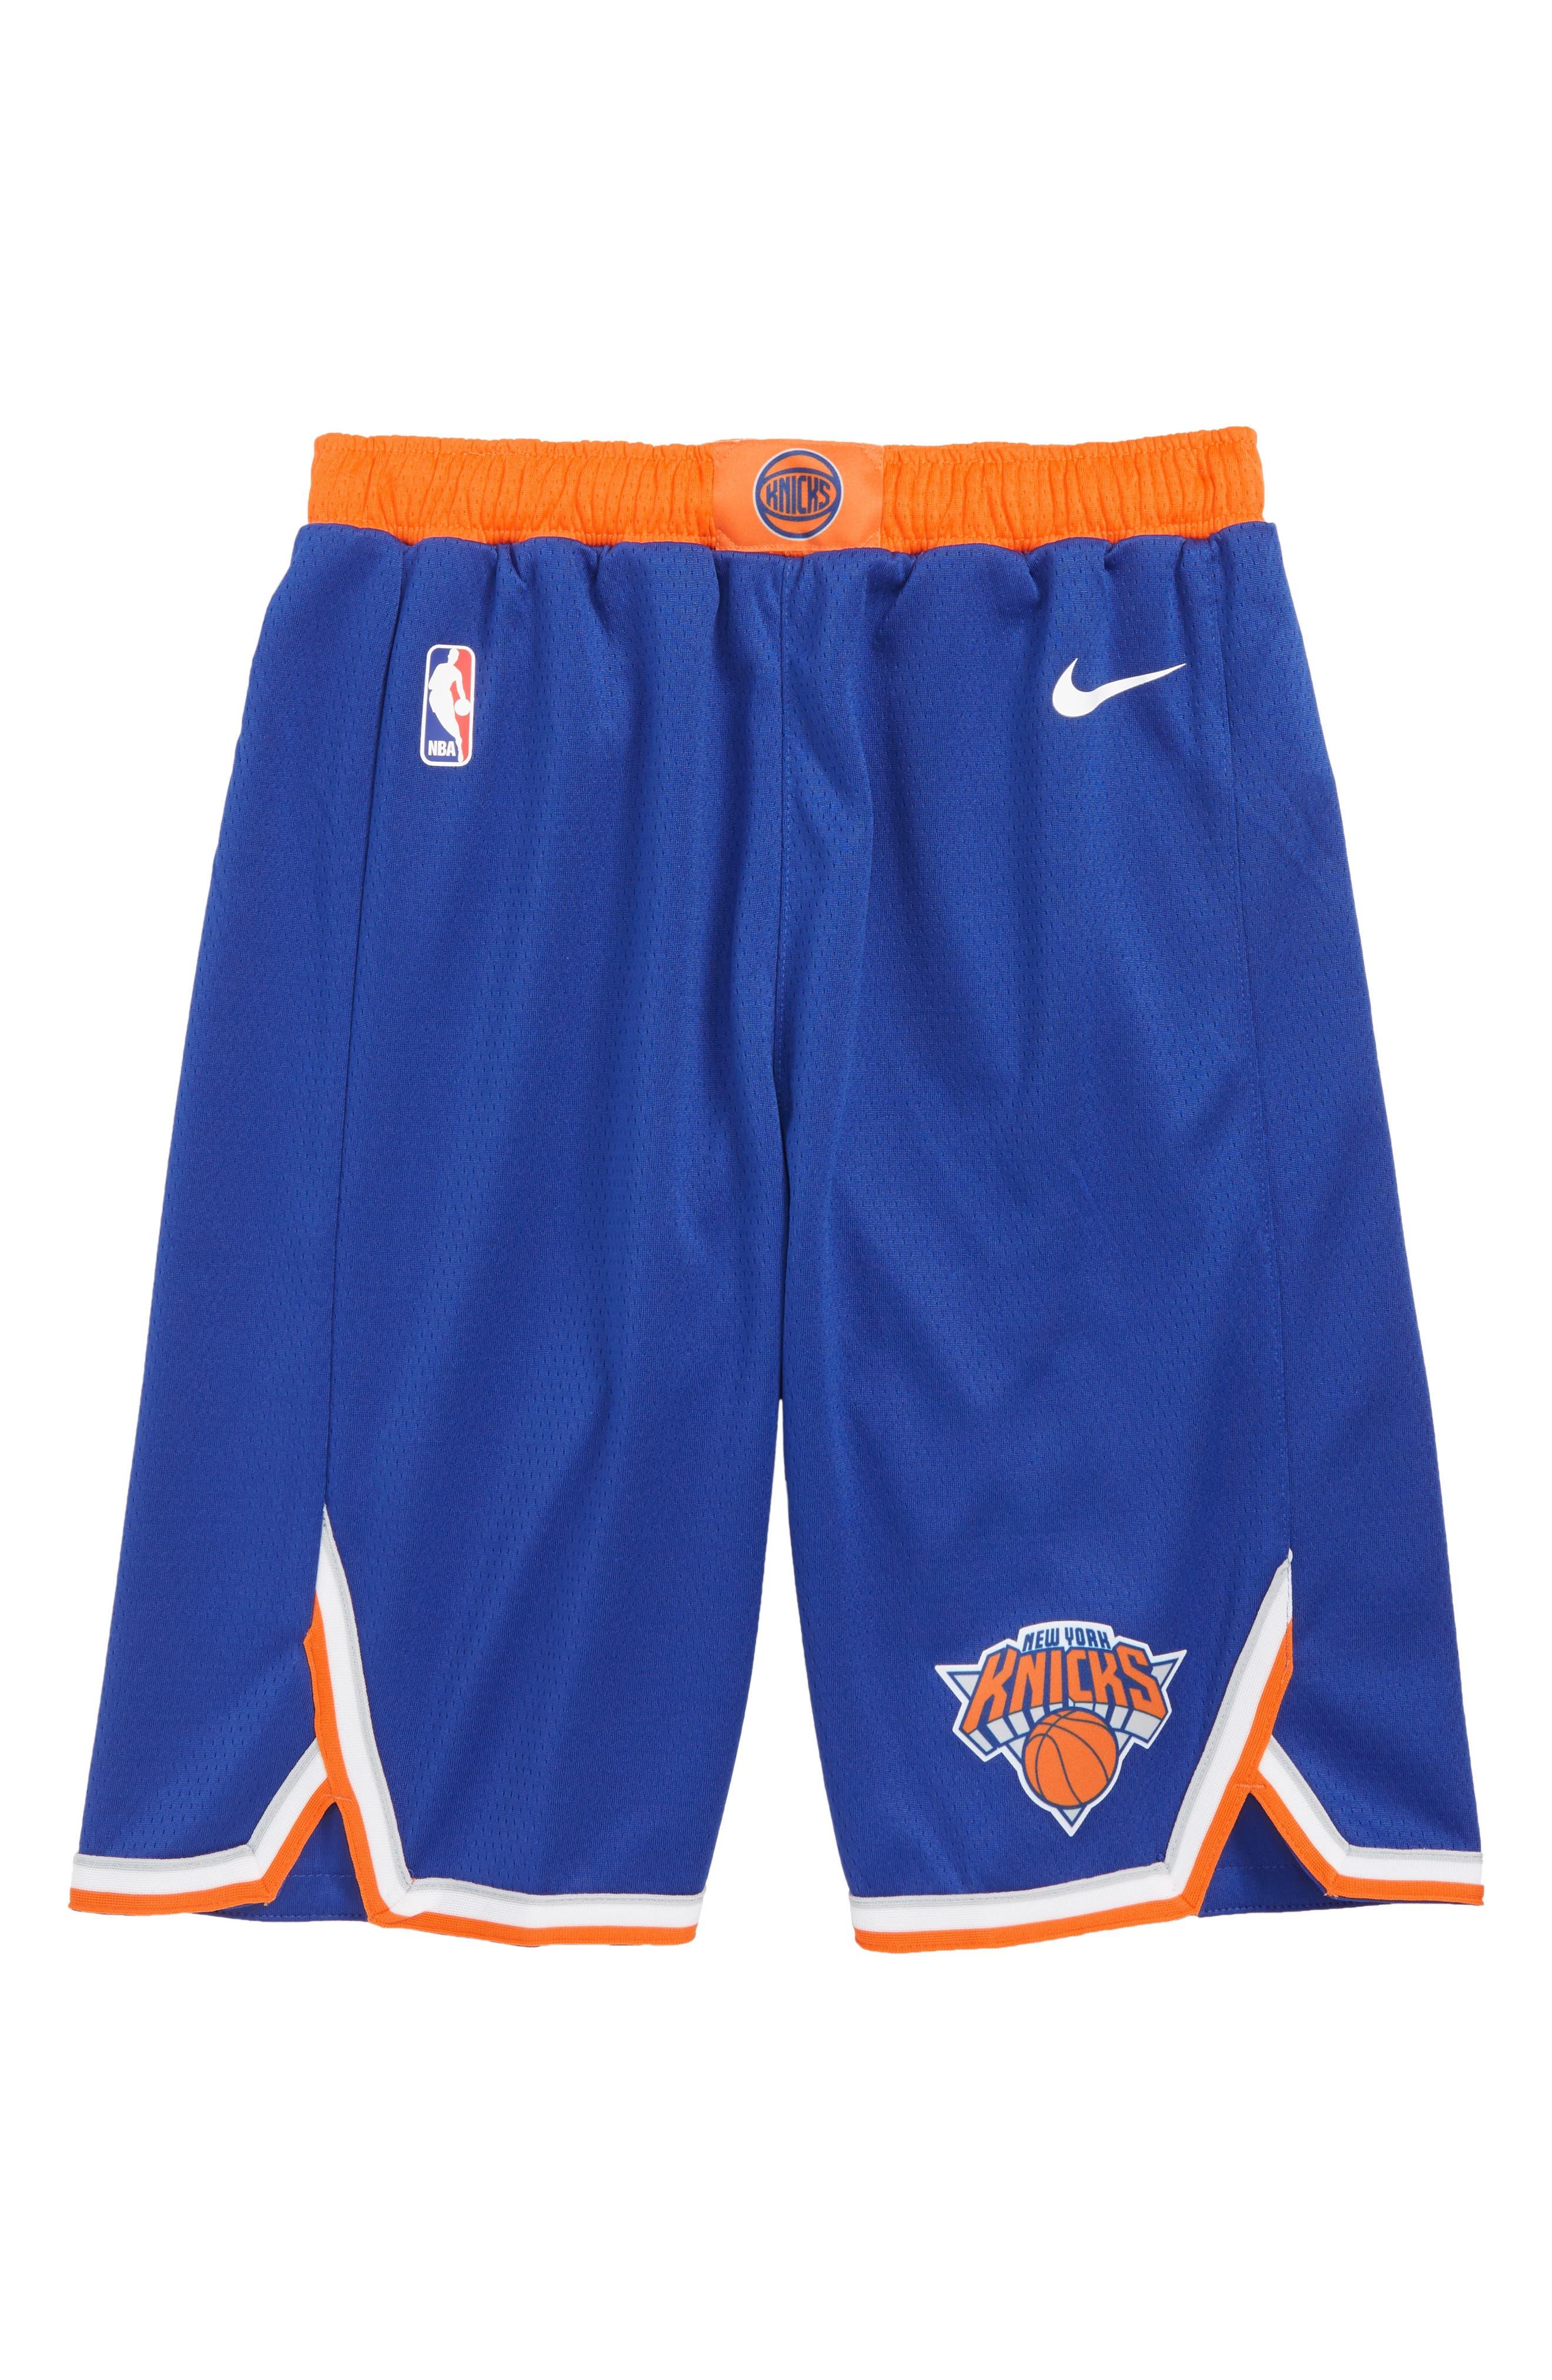 Icon New York Knicks Basketball Shorts, Main, color, RUSH BLUE